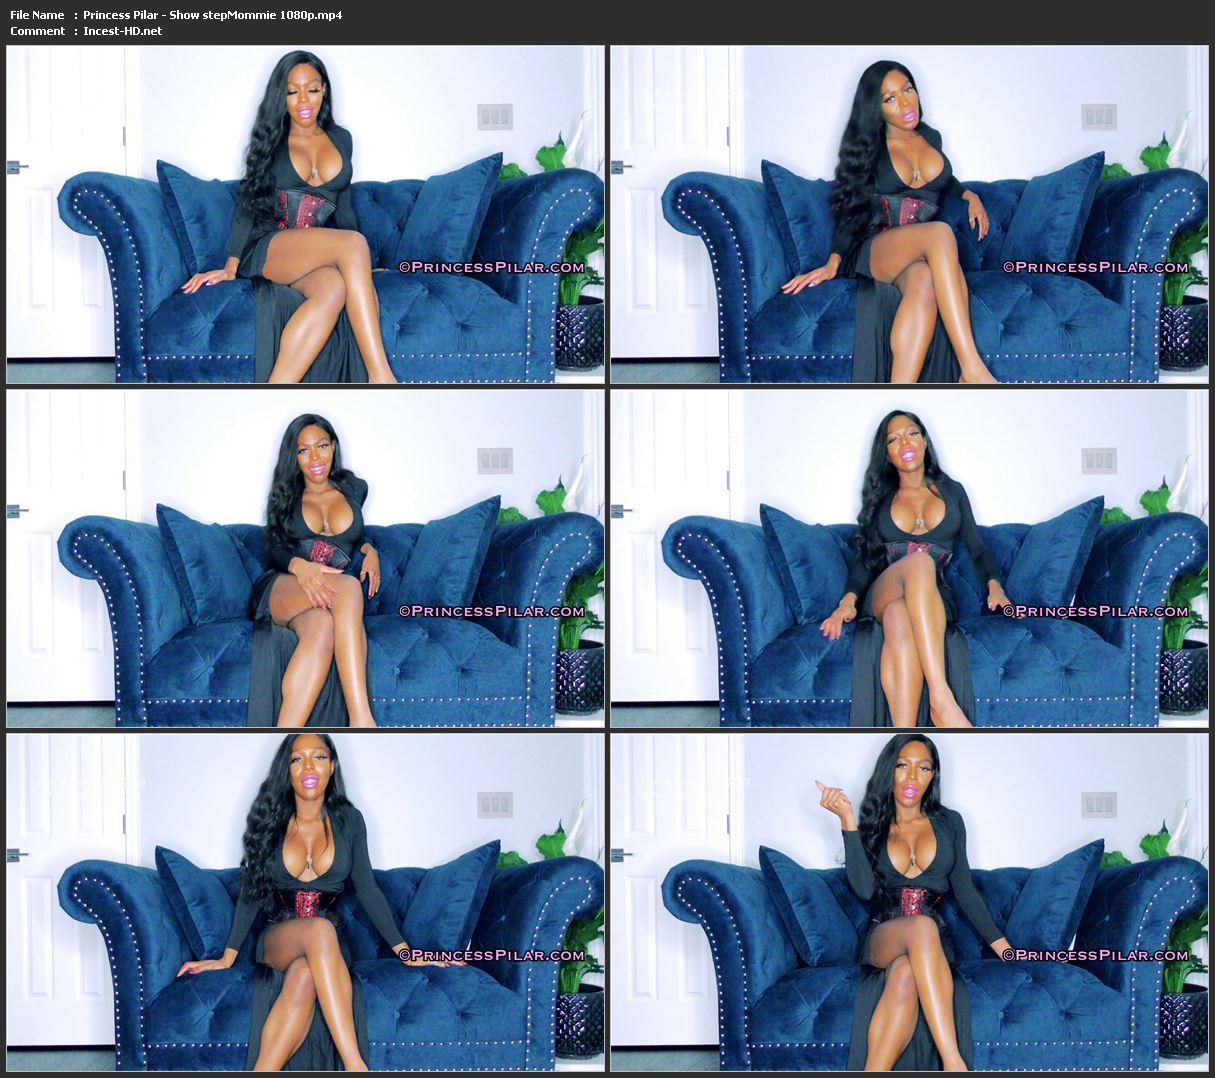 Princess Pilar - Show stepMommie 1080p